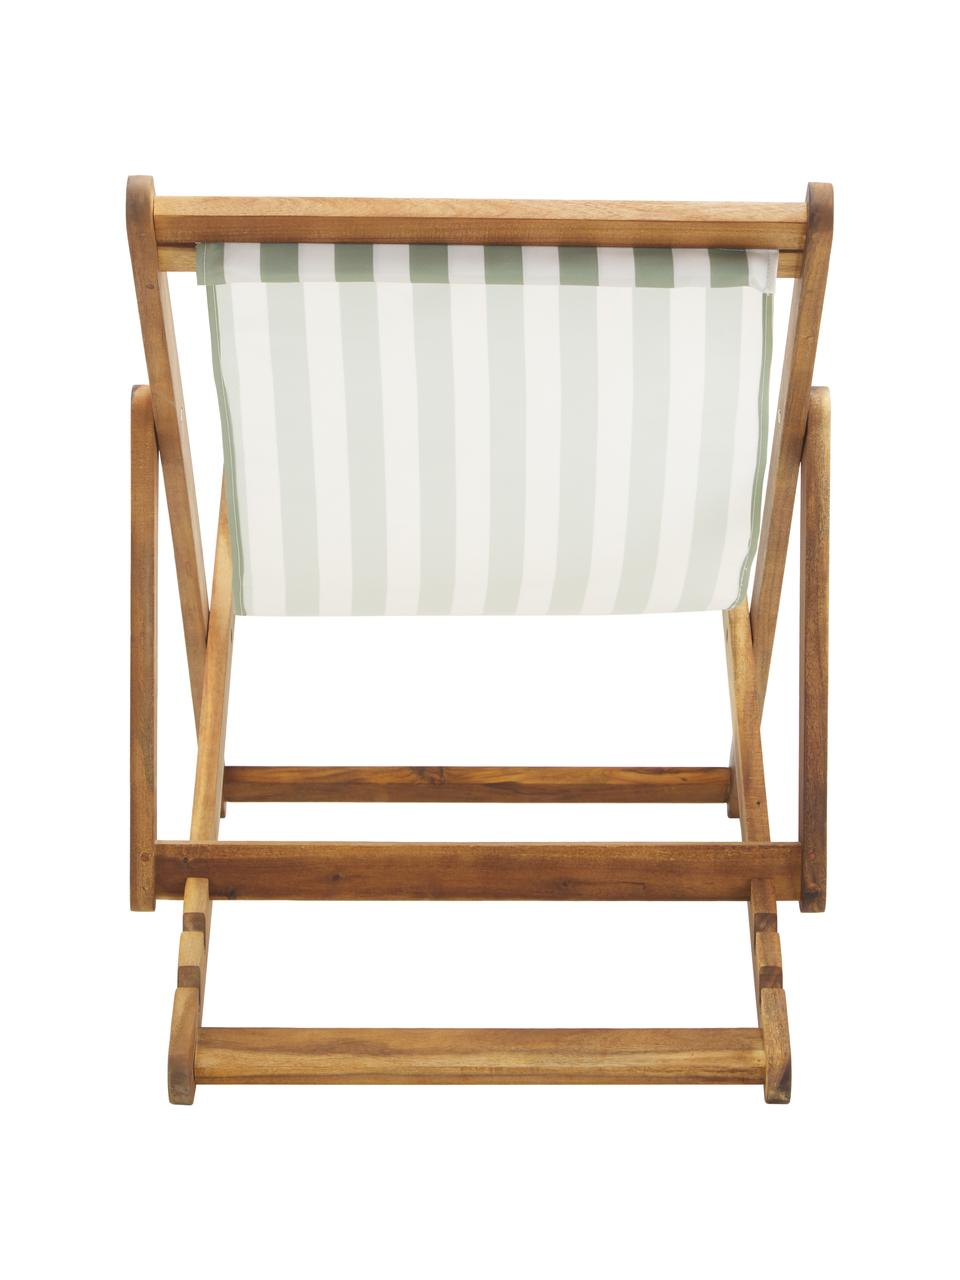 Transat pliable en bois Zoe, Vert, blanc